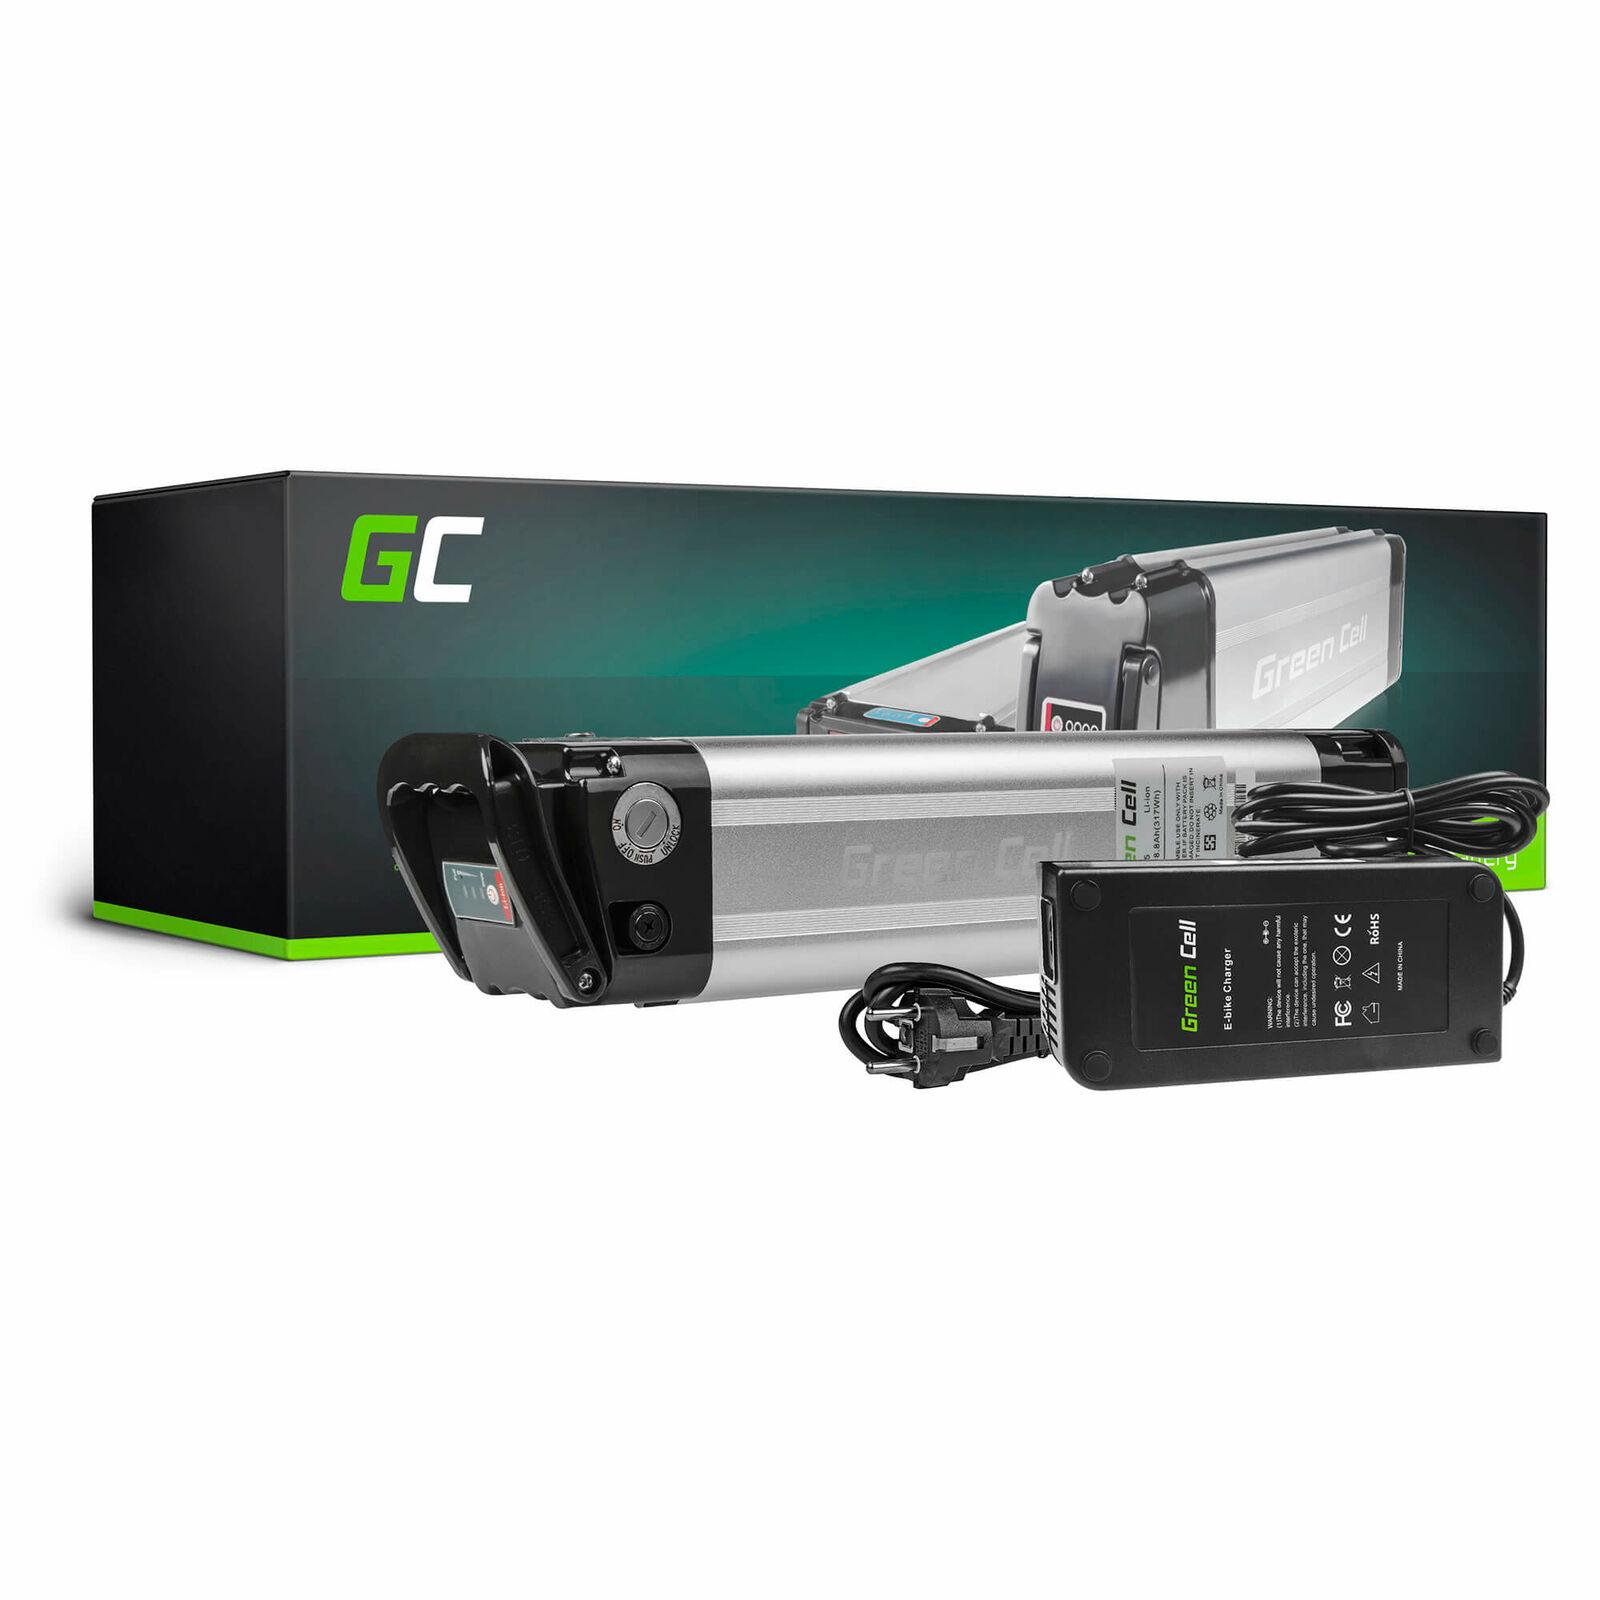 GC® E-BIKE Fahrrad Akku 36V 8.8Ah 317Wh Pedelec Silberfish mit Ladegerät